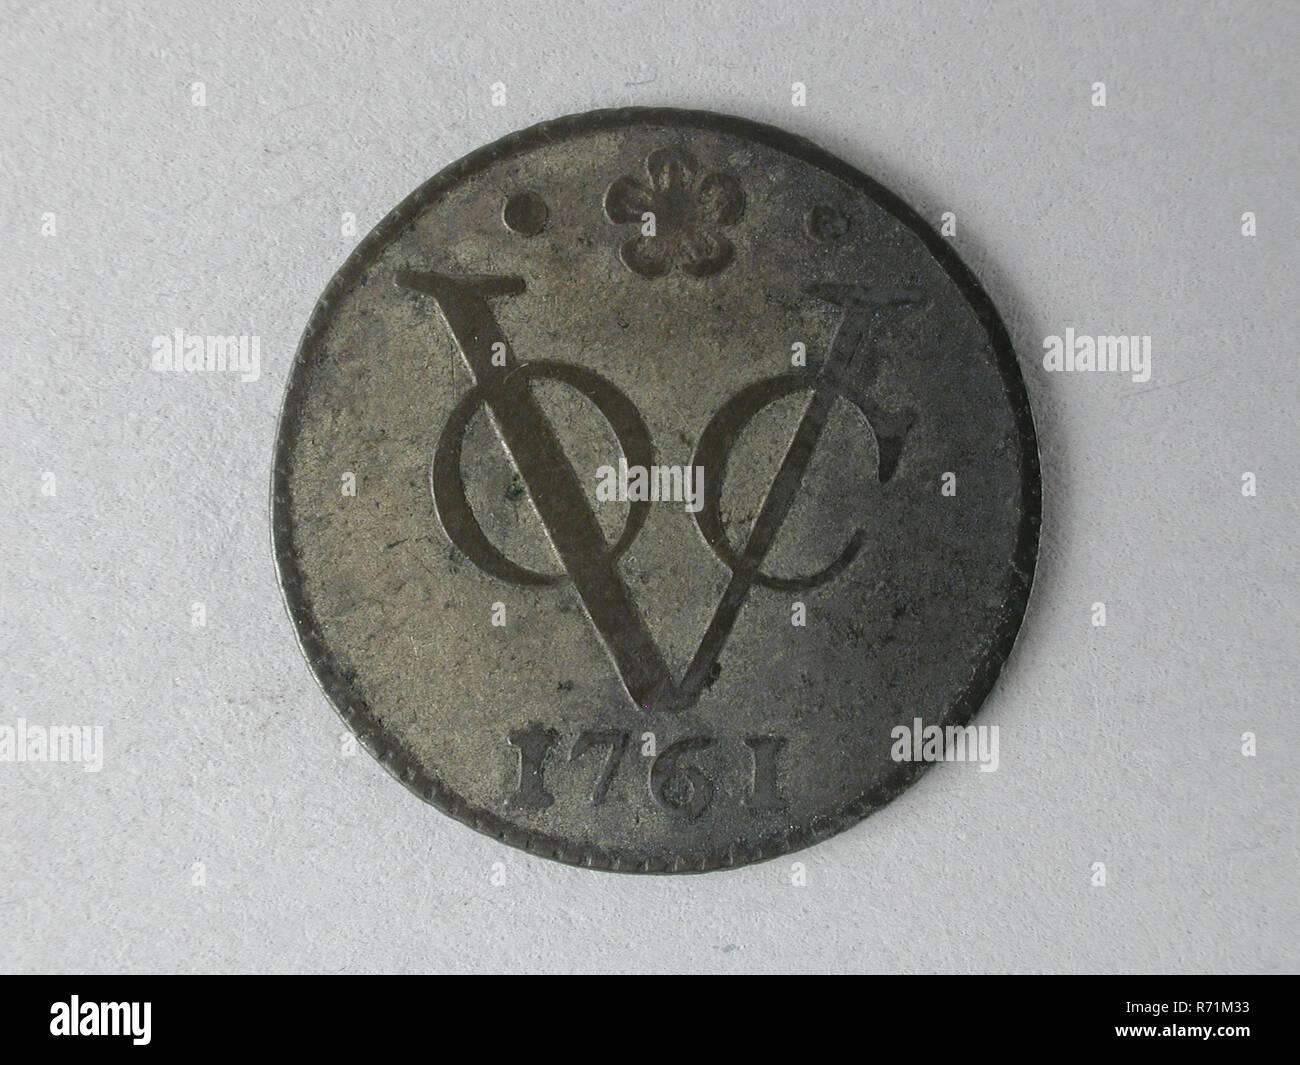 Sonstige Active Penny Münze Südafrika Münzen